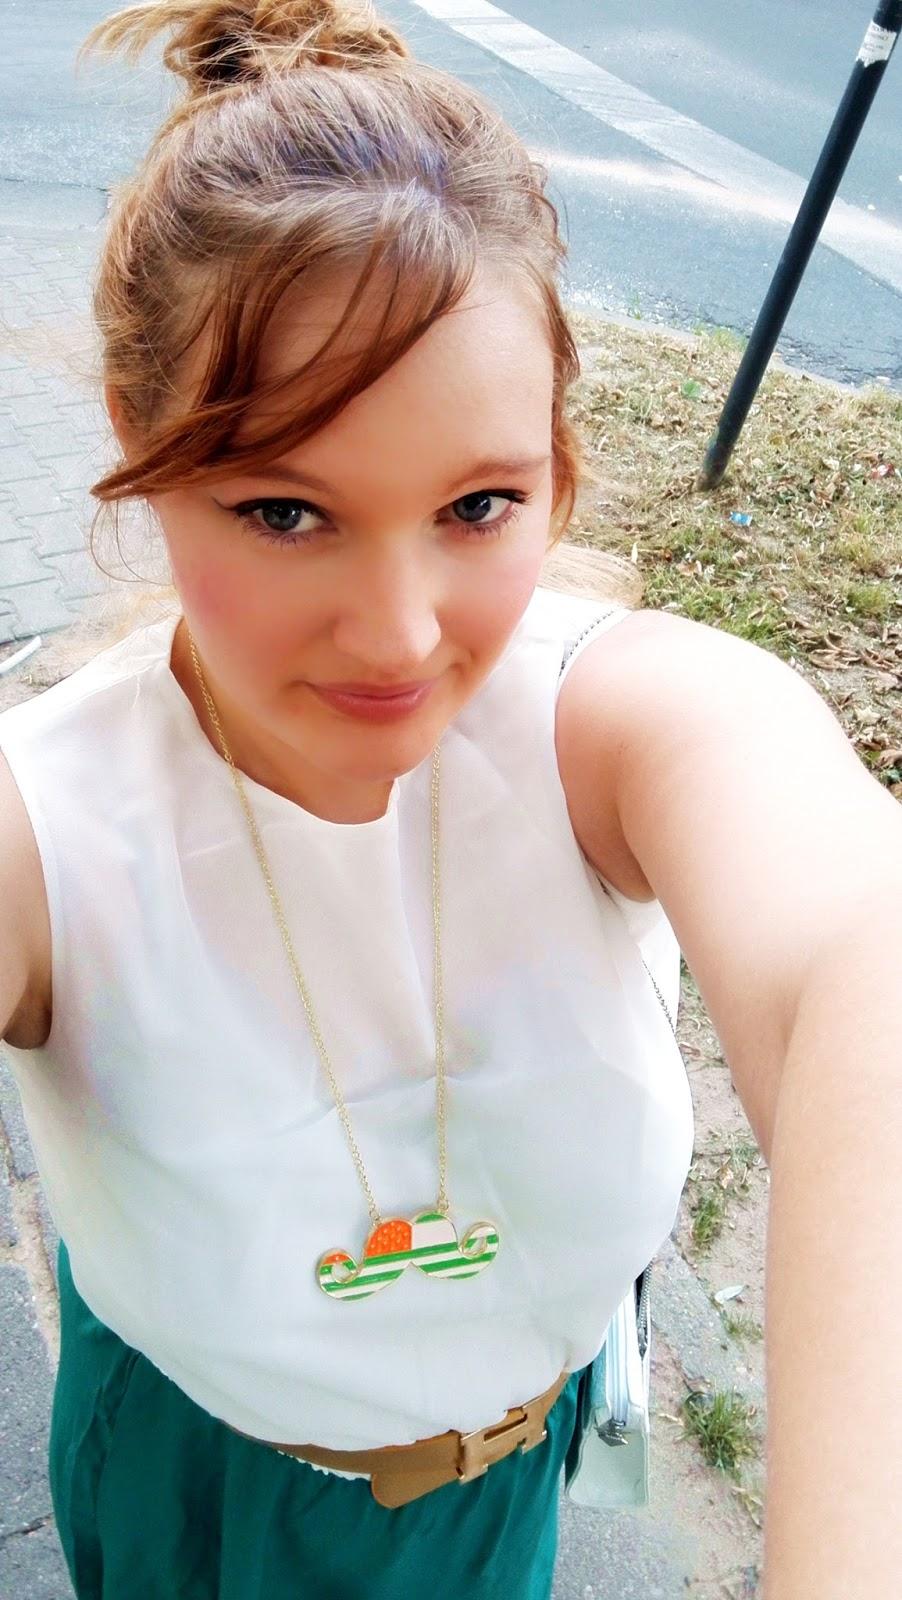 selfie-z-funkcja-upiekszania